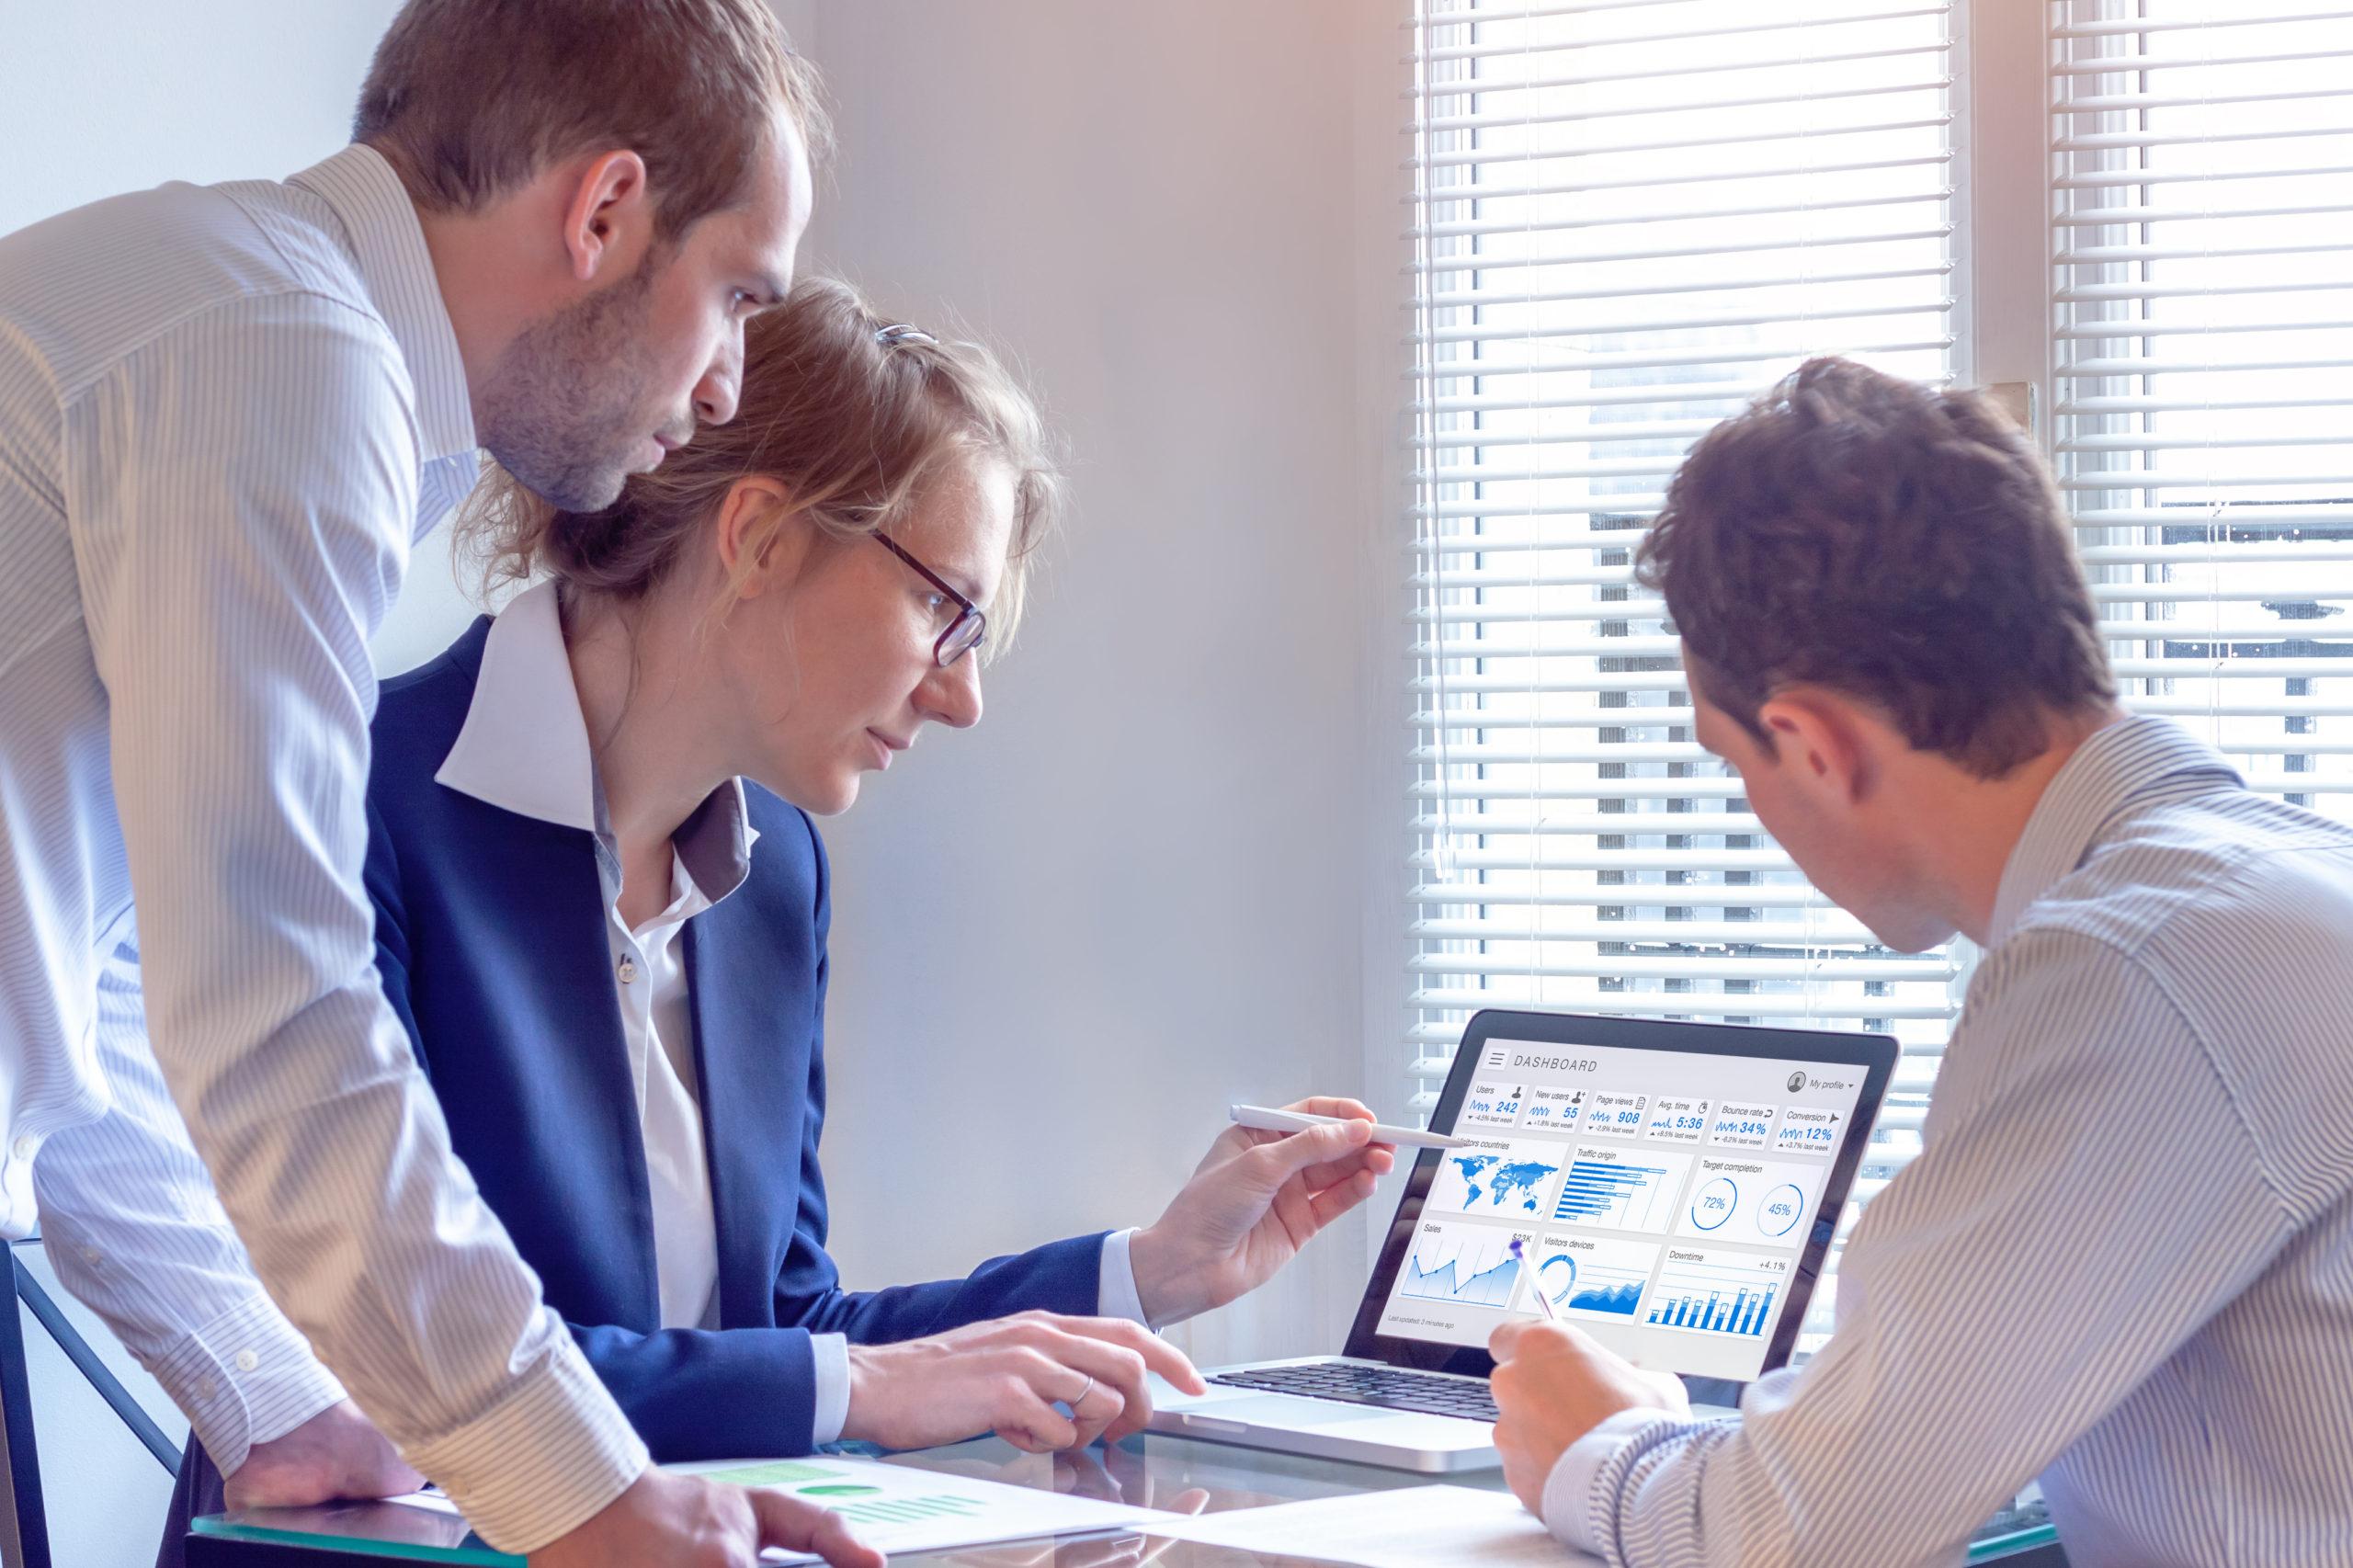 Cloud-enabled DevOps for a leading health management firm